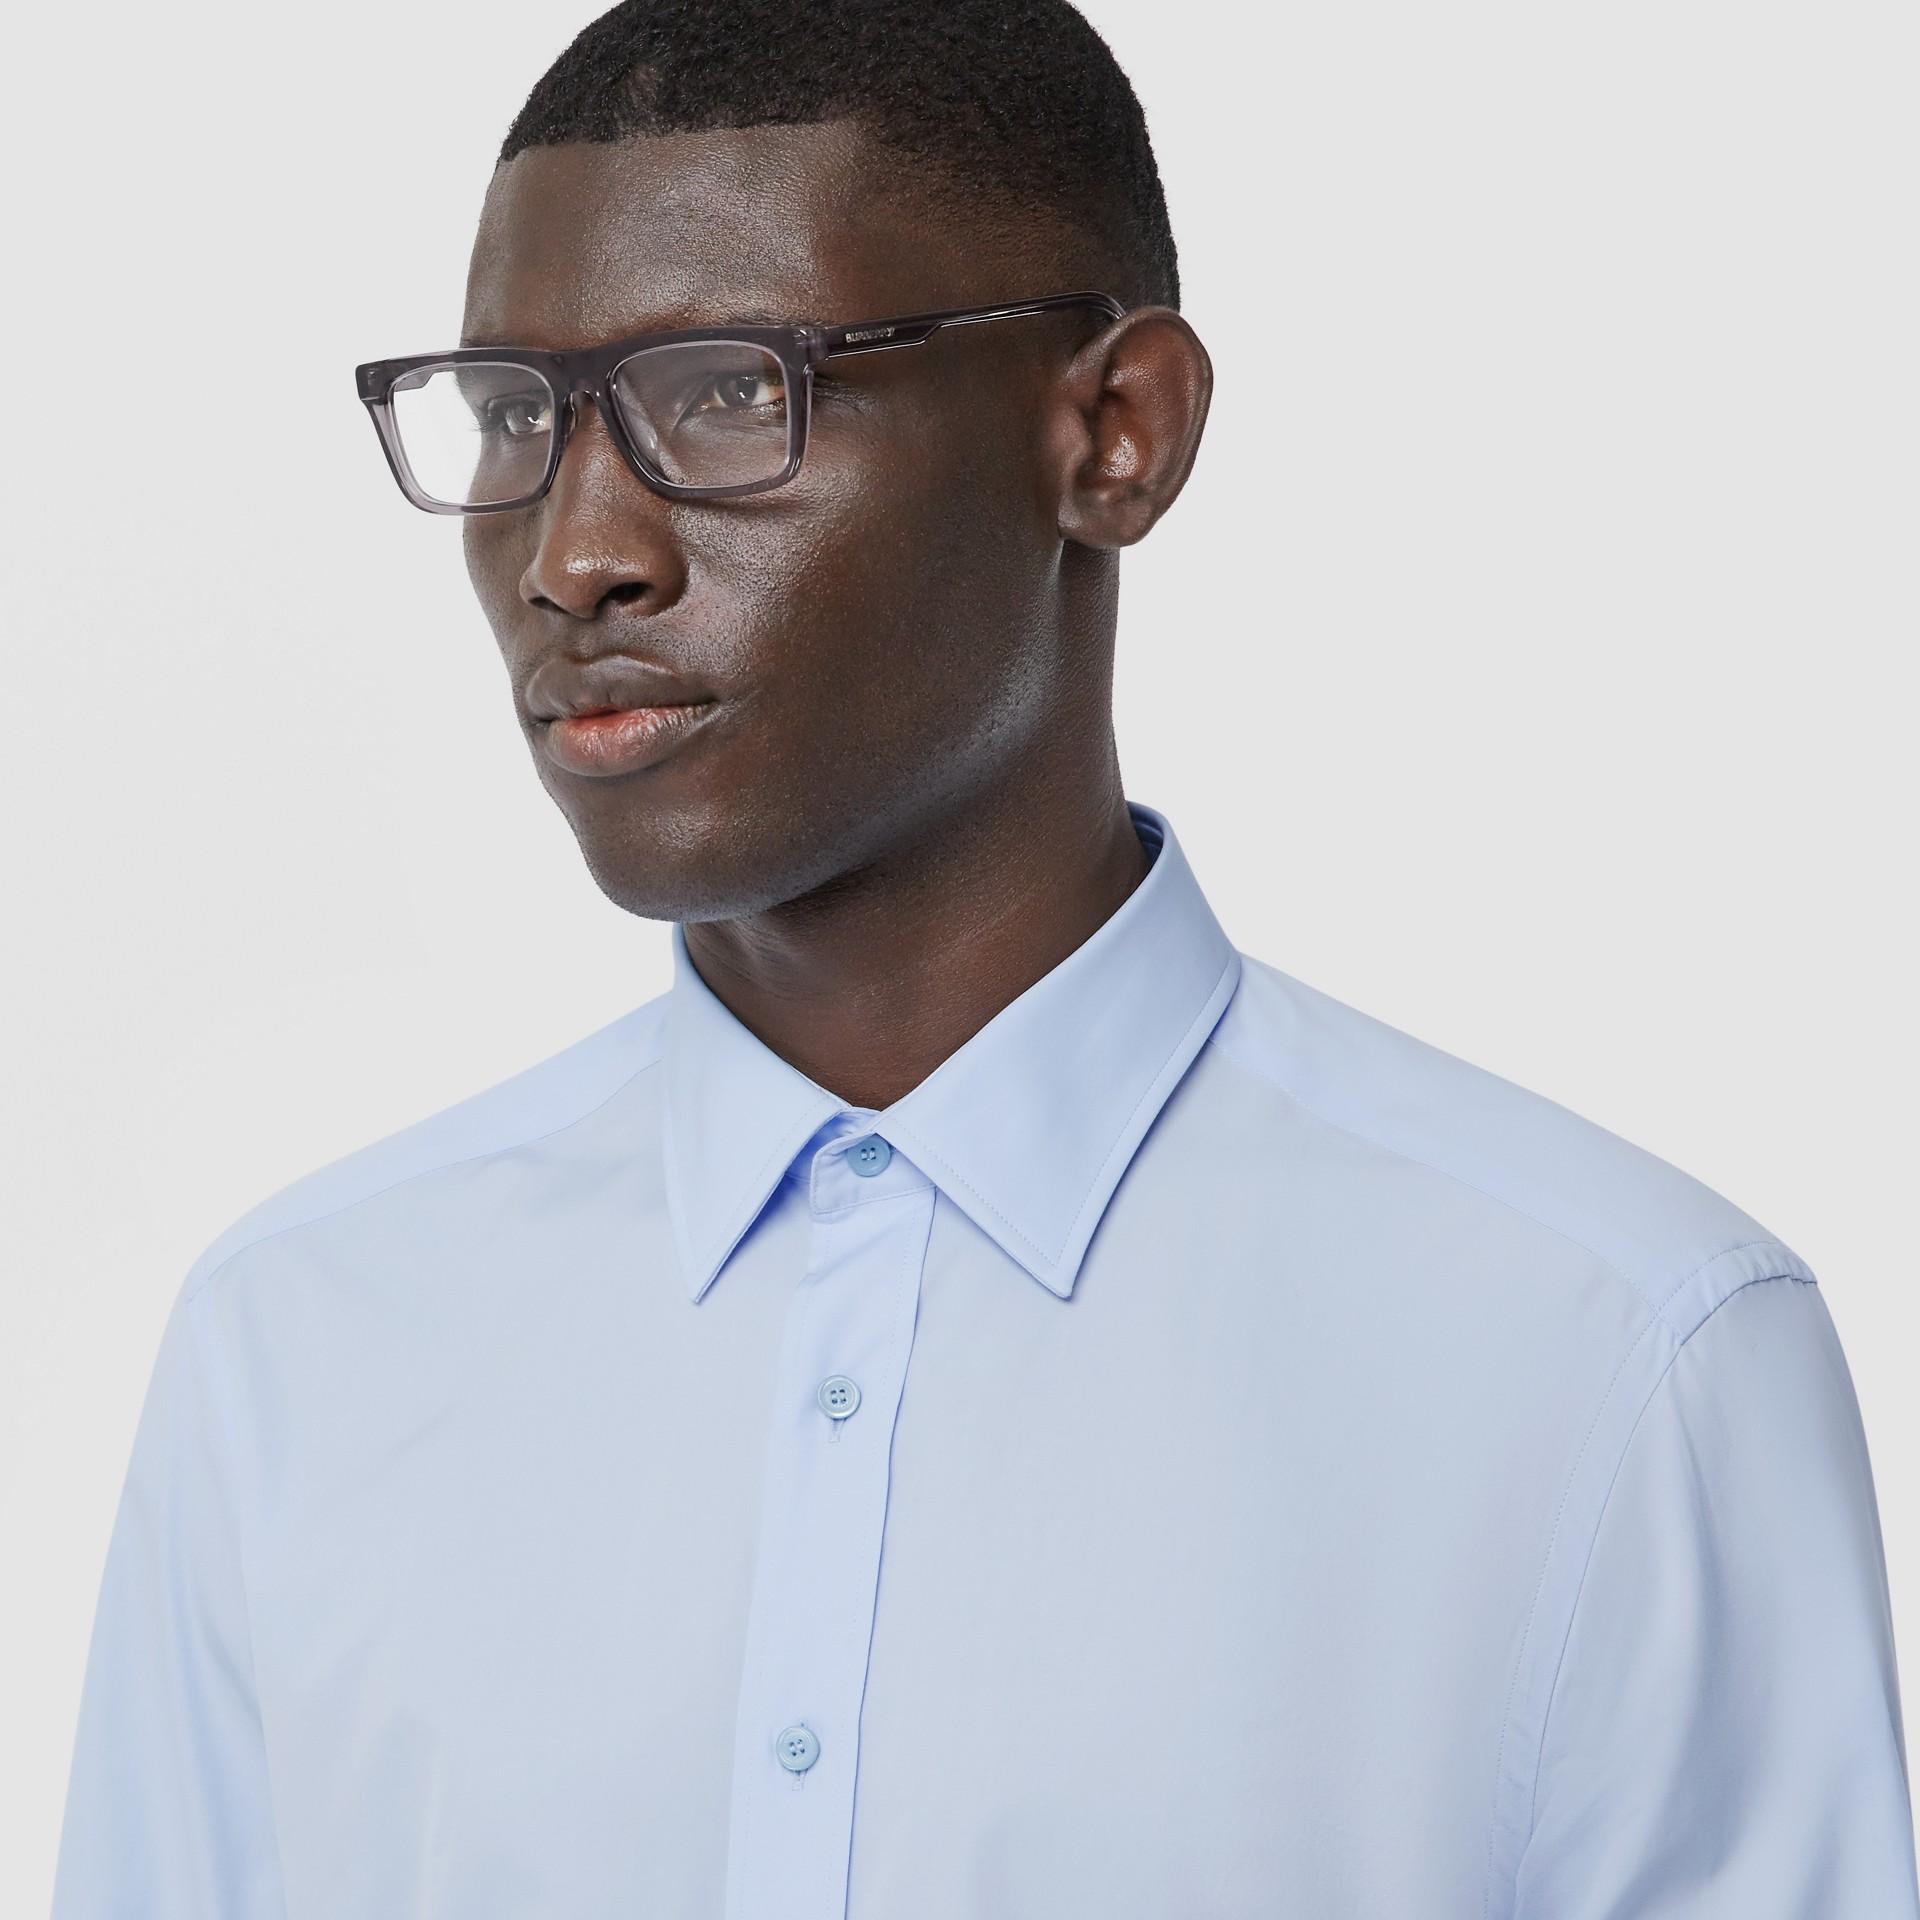 Classic Fit Monogram Motif Cotton Poplin Shirt in Pale Blue - Men | Burberry Singapore - gallery image 1